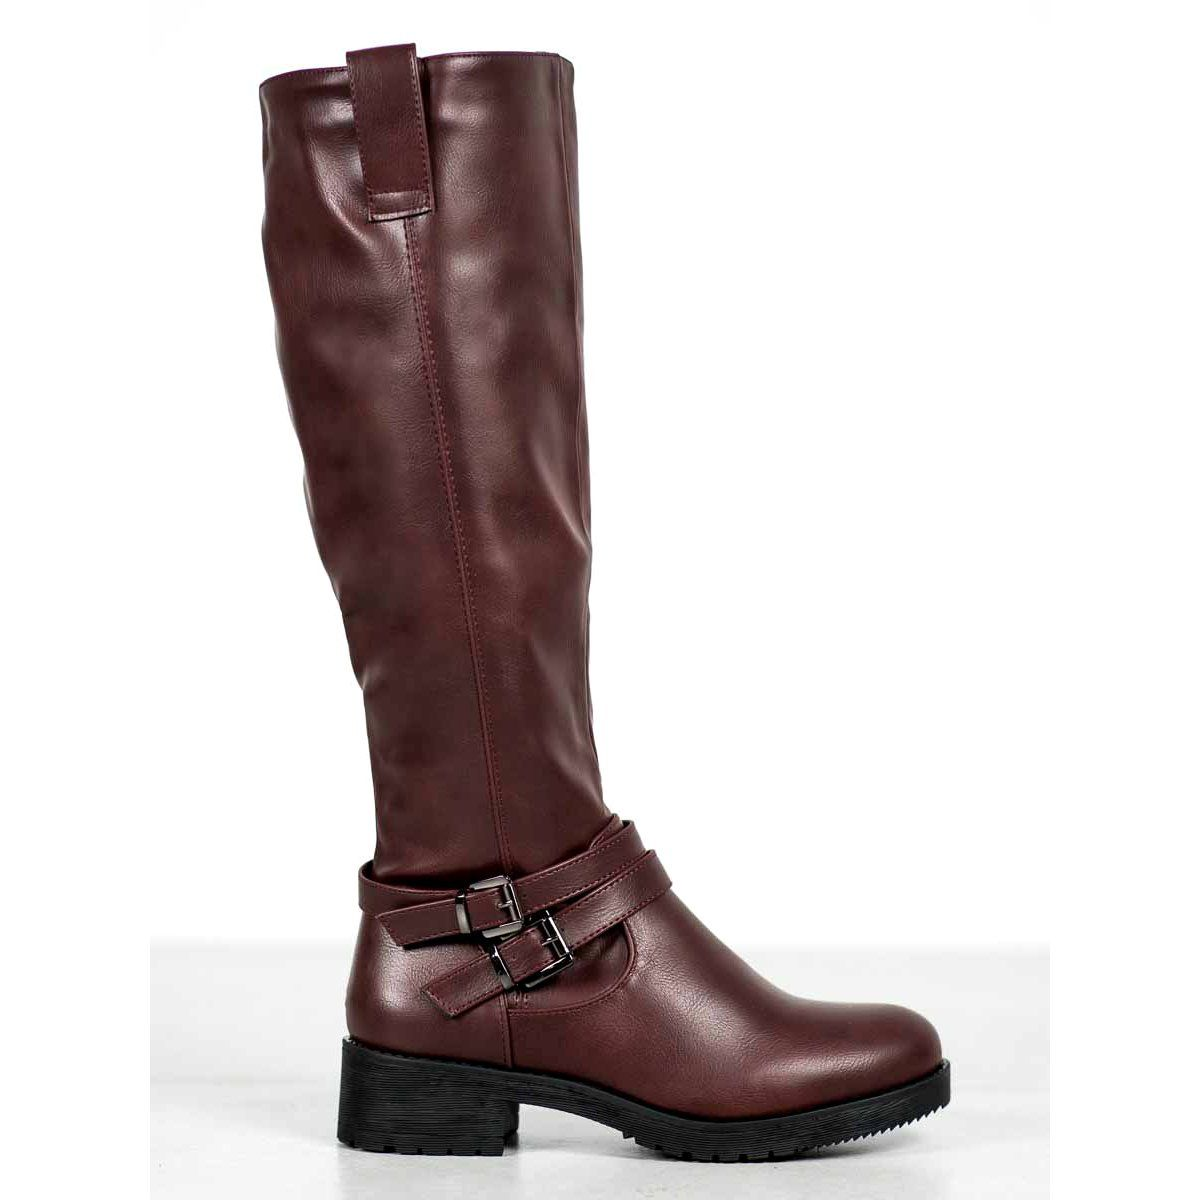 Super Me Cieple Kozaki Czerwone Boots Womens Boots Warm Boots